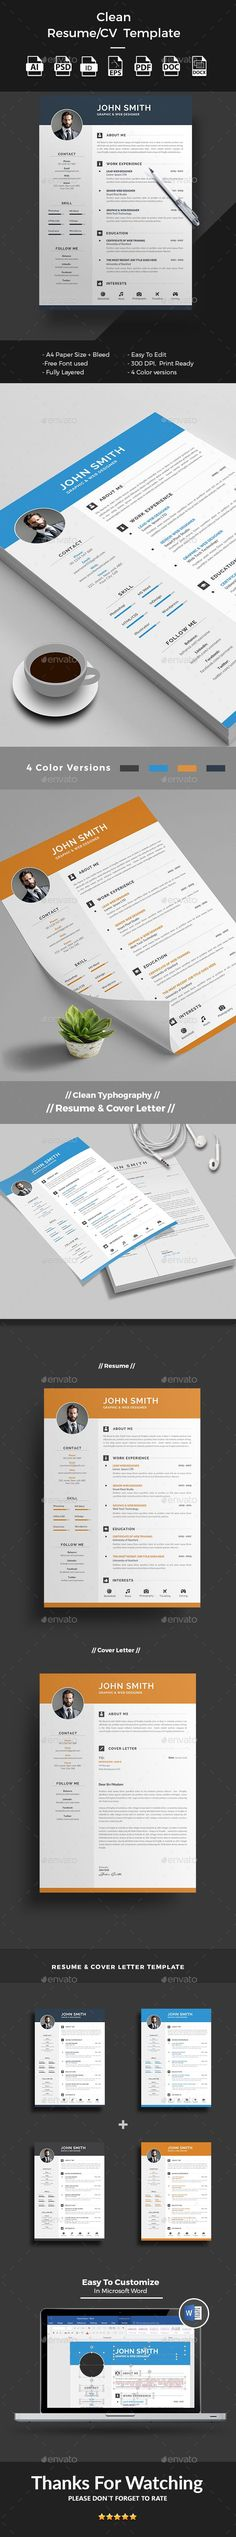 30 Free Printable Resume Templates 2017 to